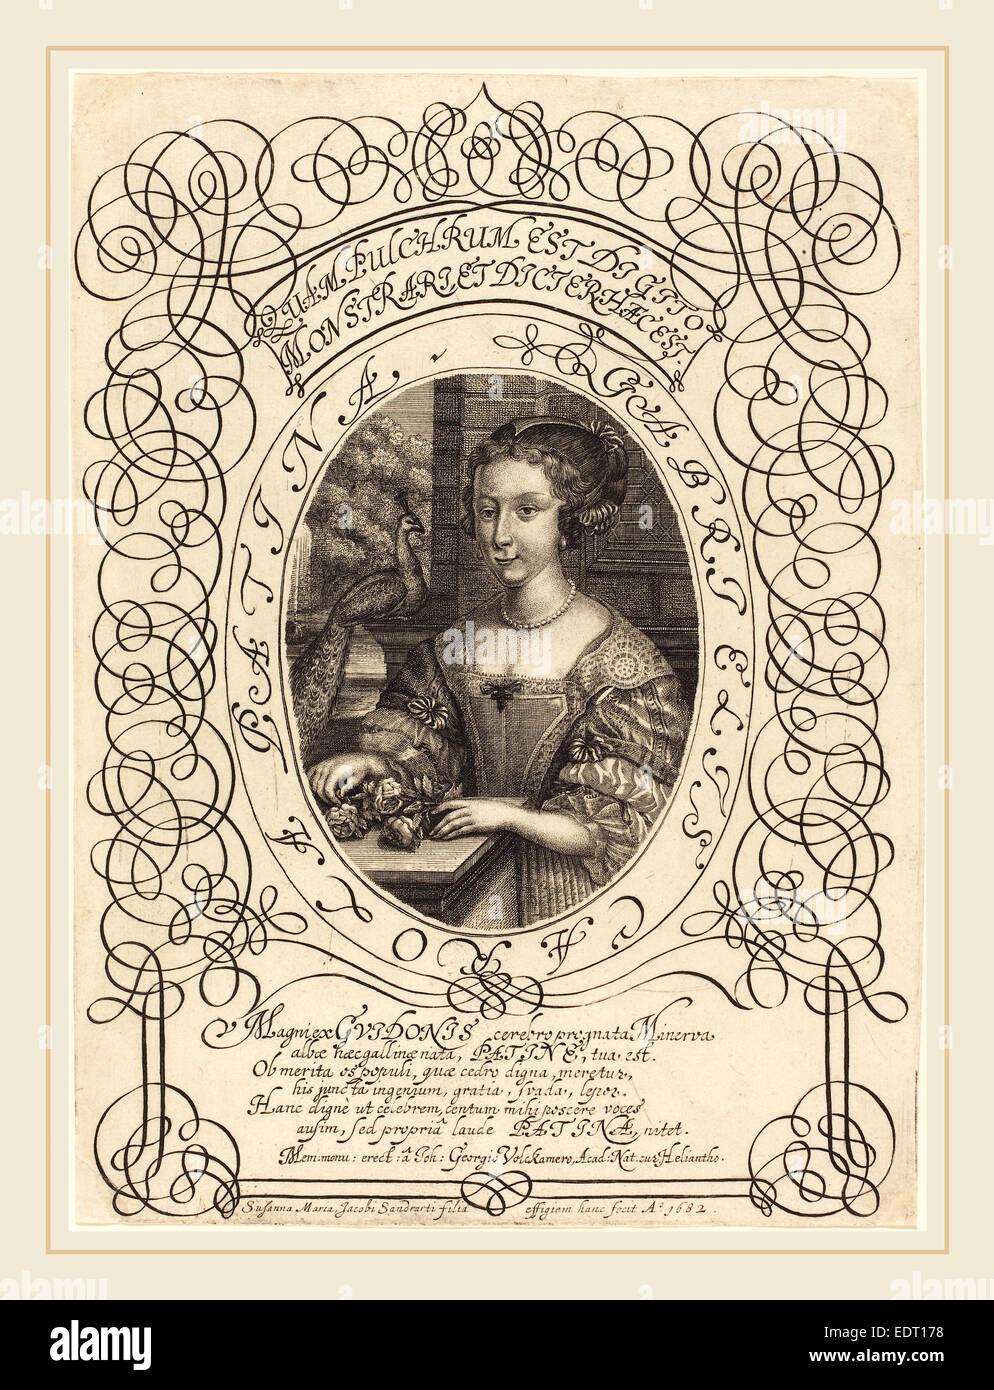 Susanne Maria von Sandrart (German, 1658-1716), Gabrielle Carola Patina, c. 1682, engraving Stock Photo